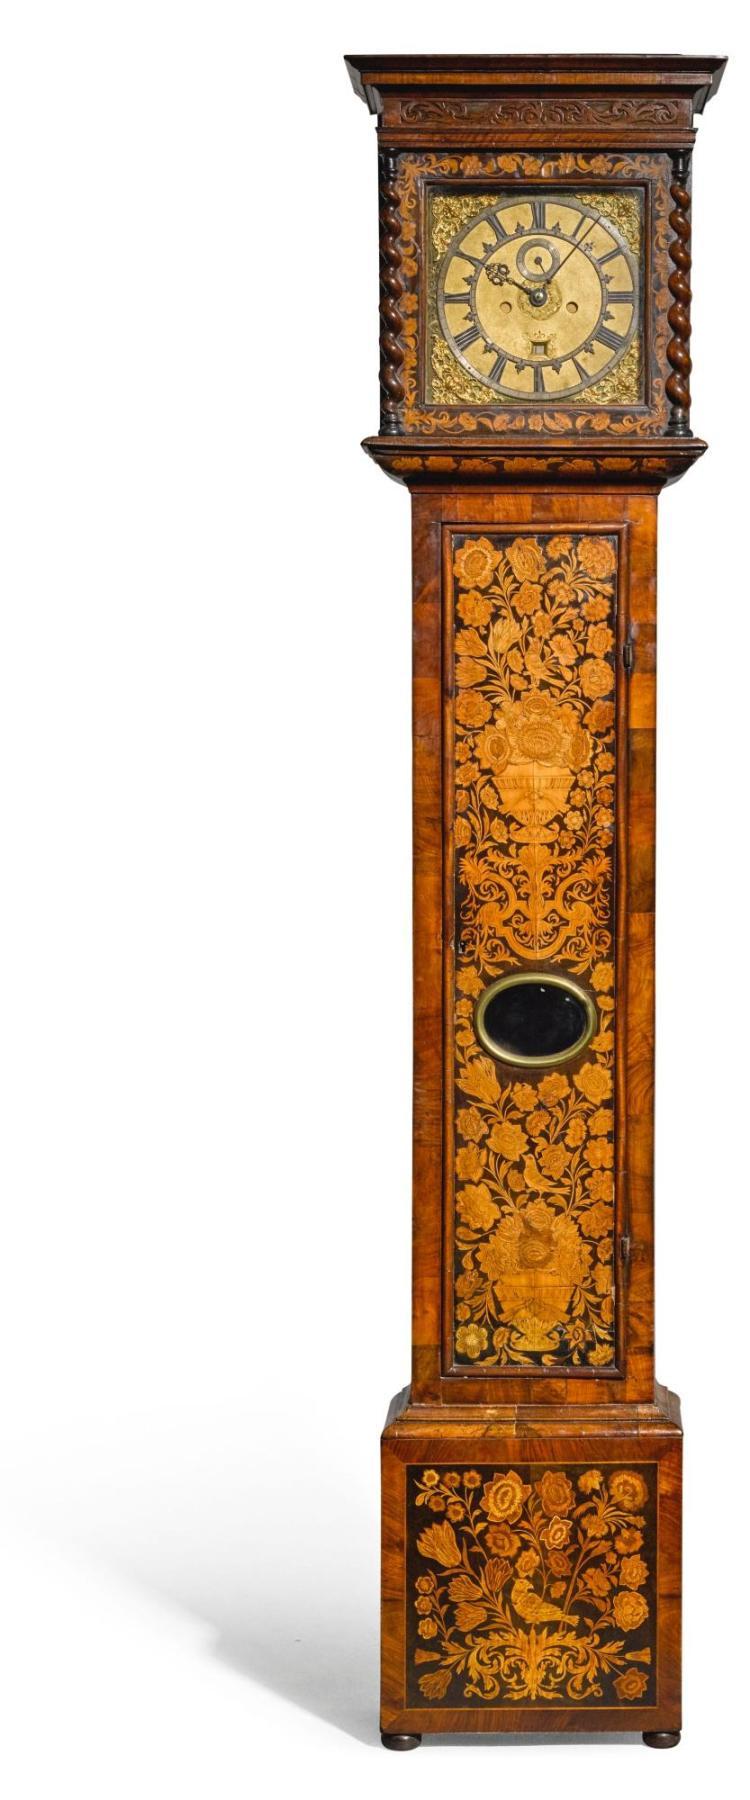 A WALNUT MARQUETRY LONGCASE CLOCK, JOHN NORCOTT, LONDON, CIRCA 1685 |